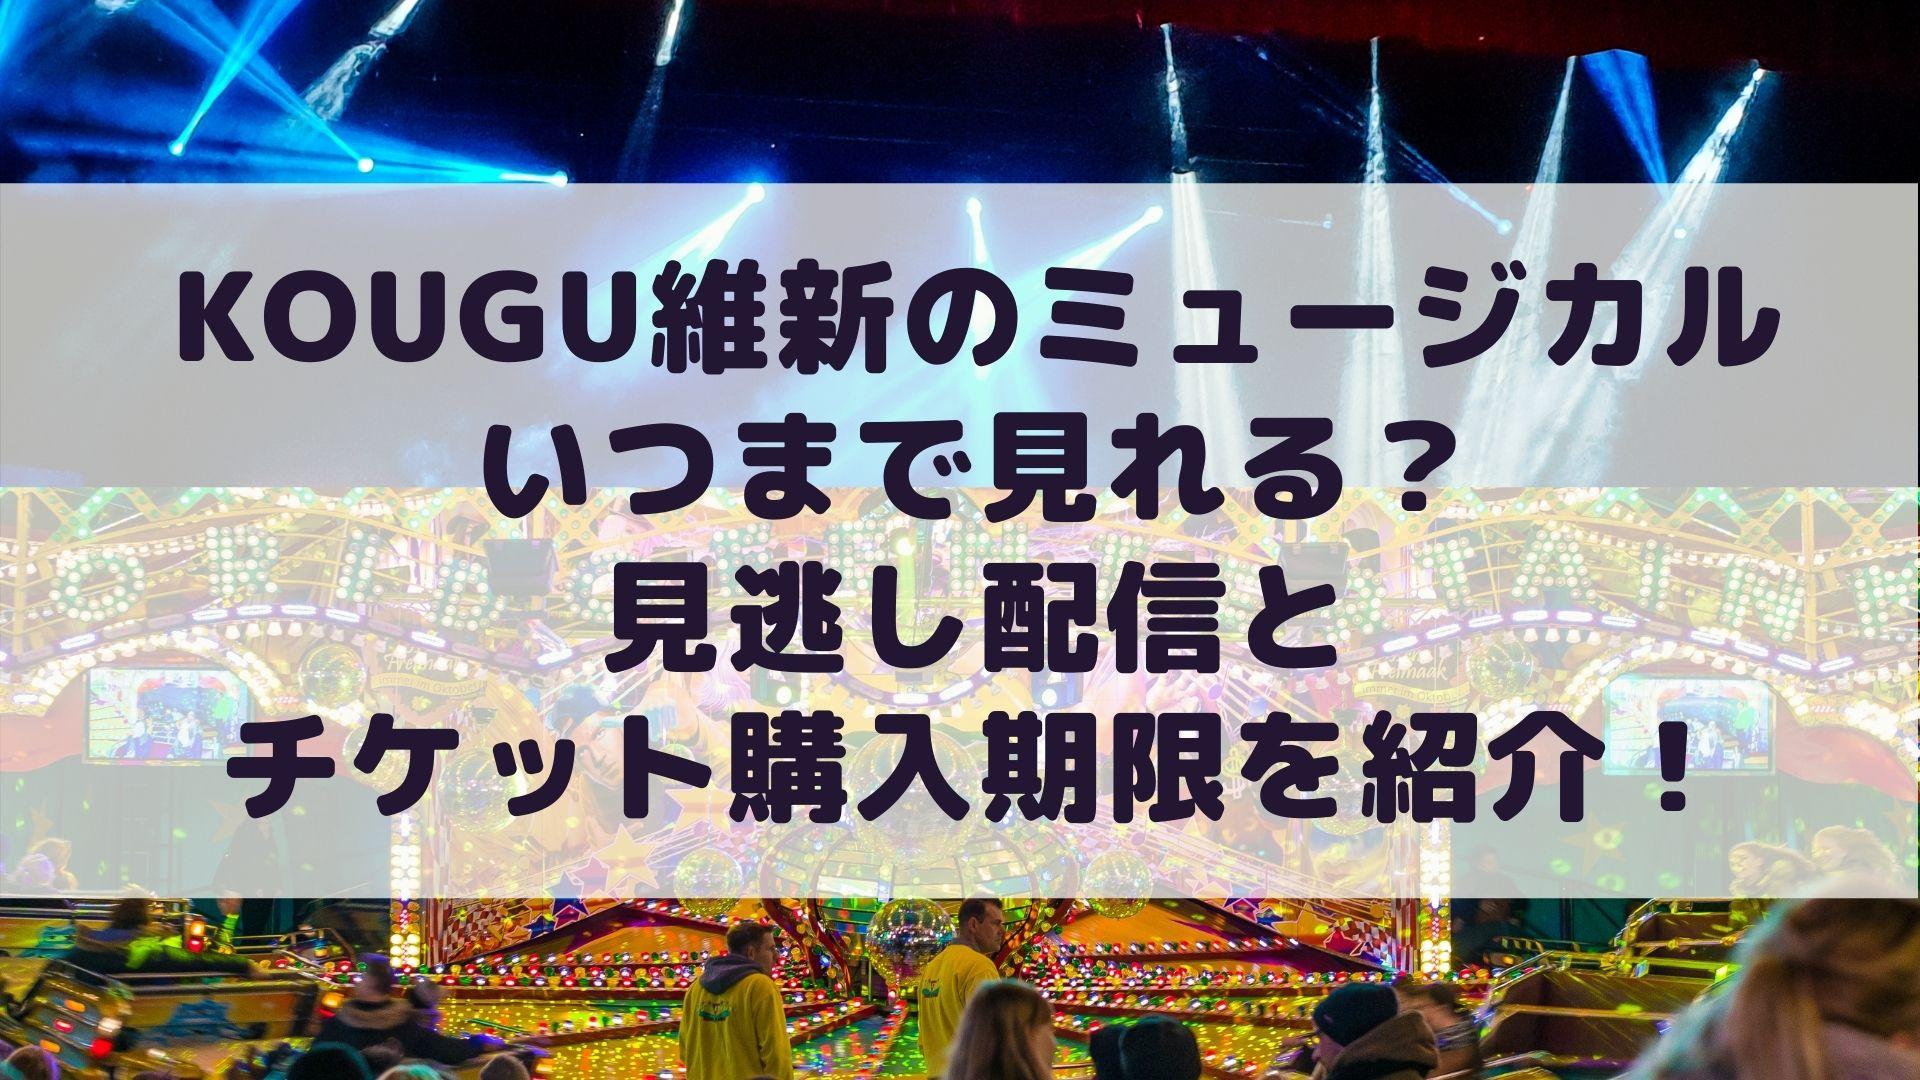 KOUGU維新のミュージカルはいつまで見れる?見逃し配信とチケット購入期限を紹介!タイトル画像